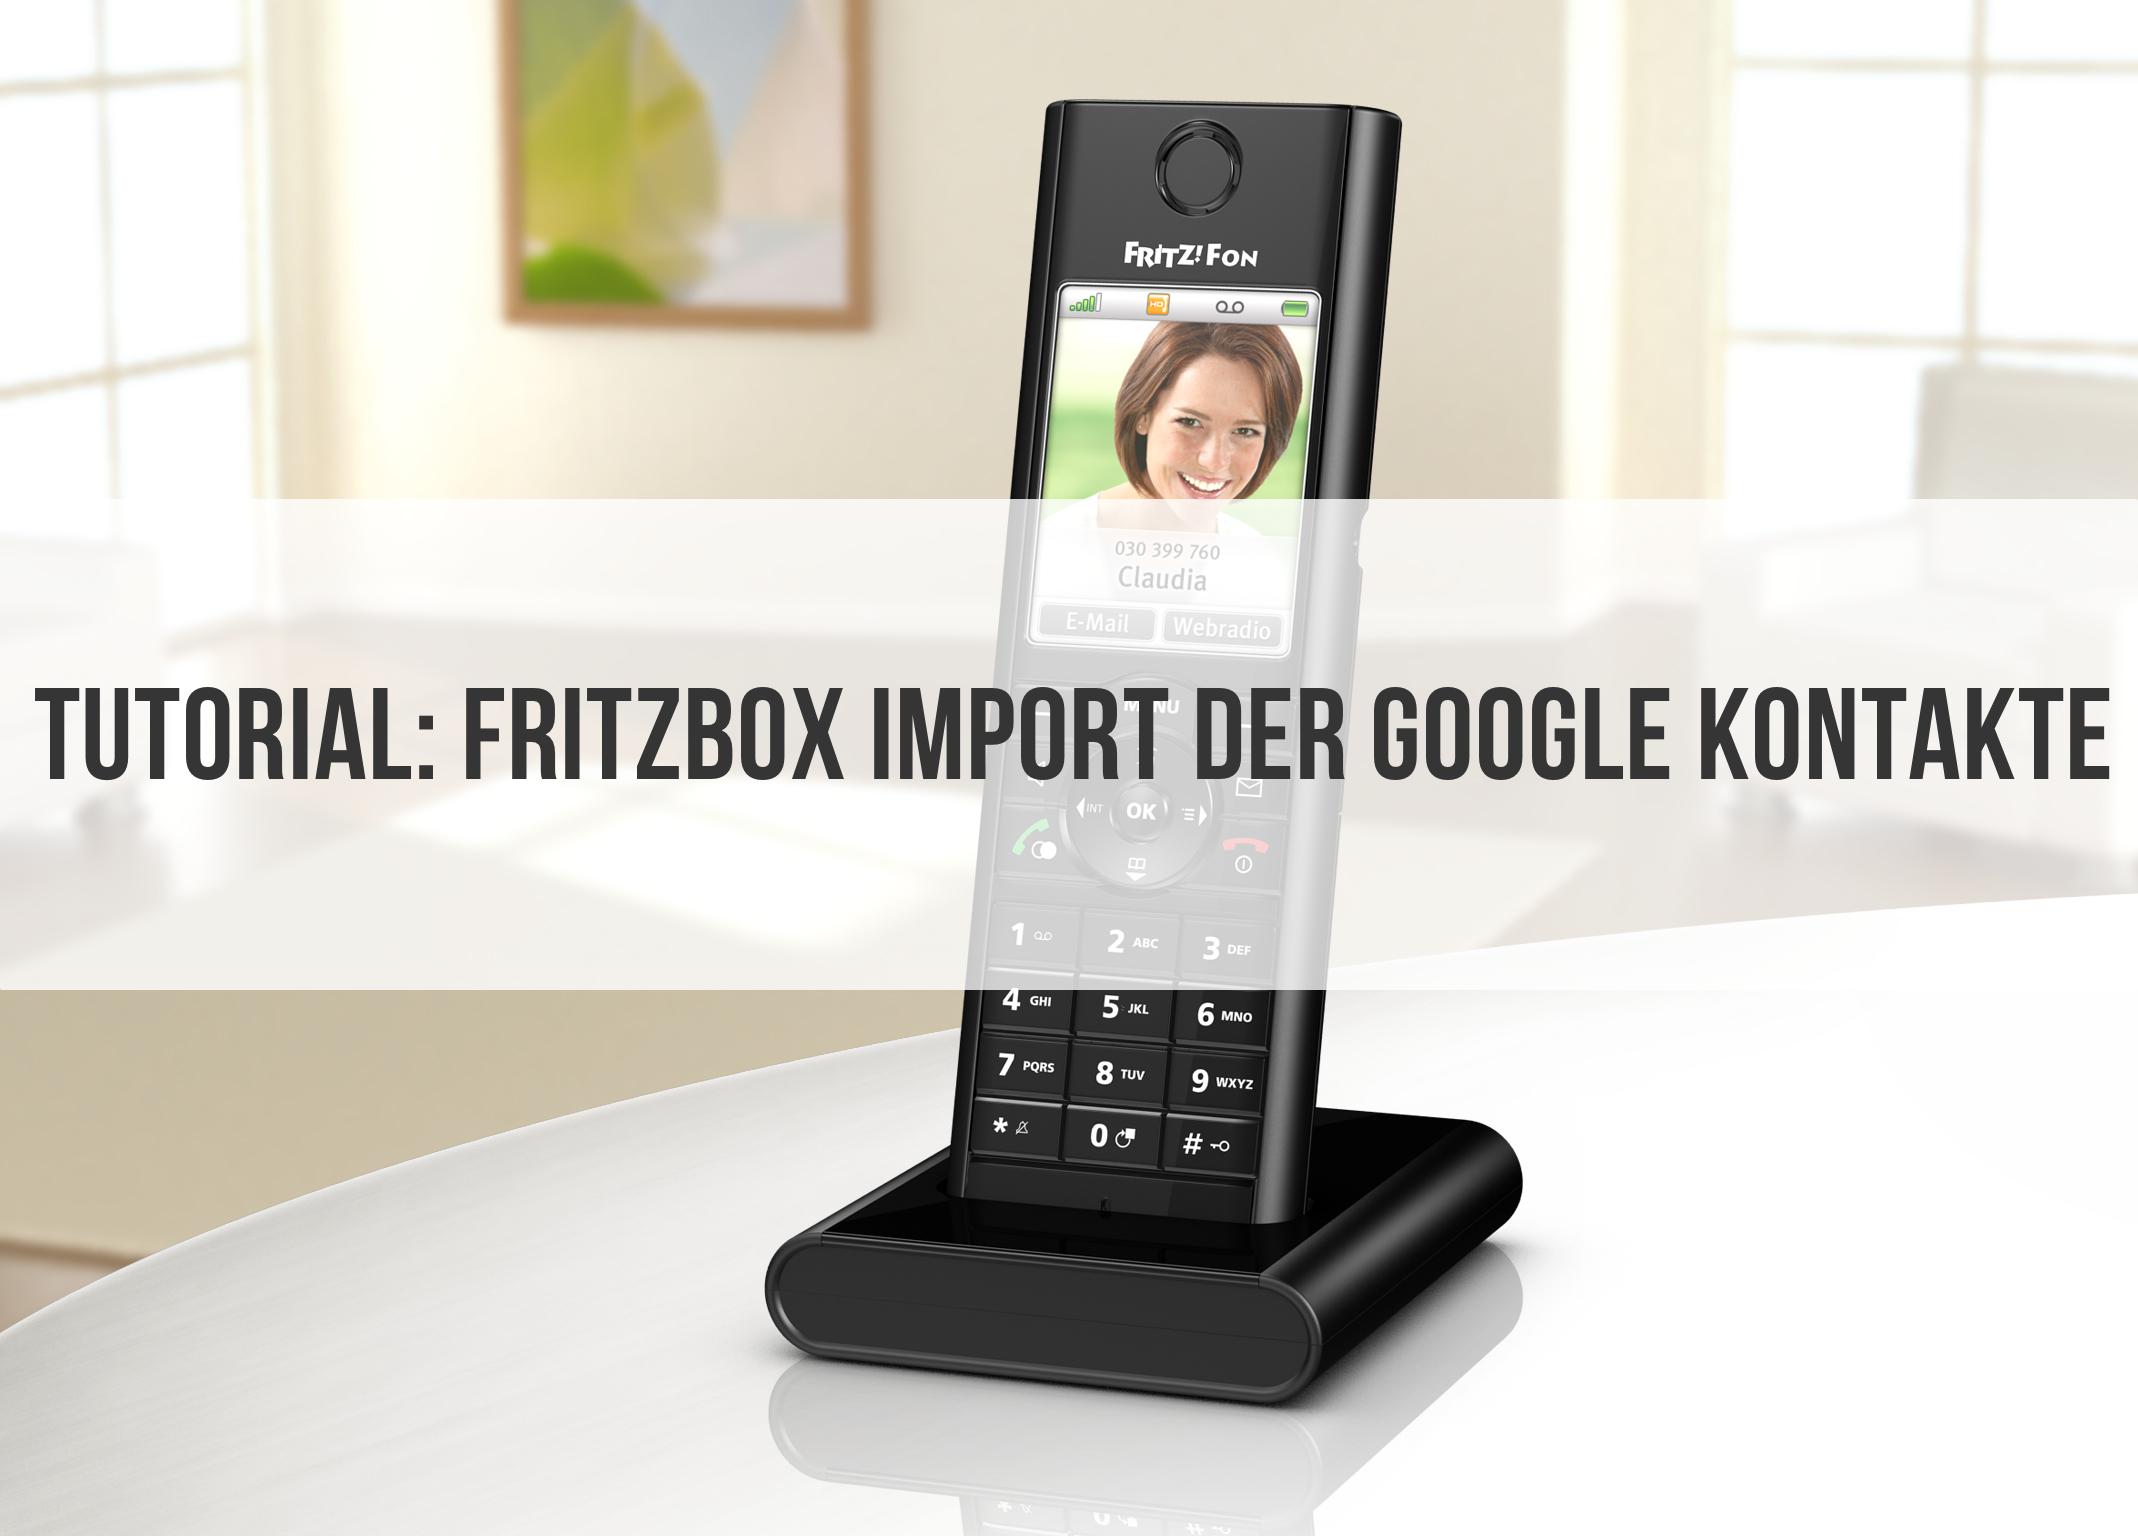 Fritzbox Google Kontakte